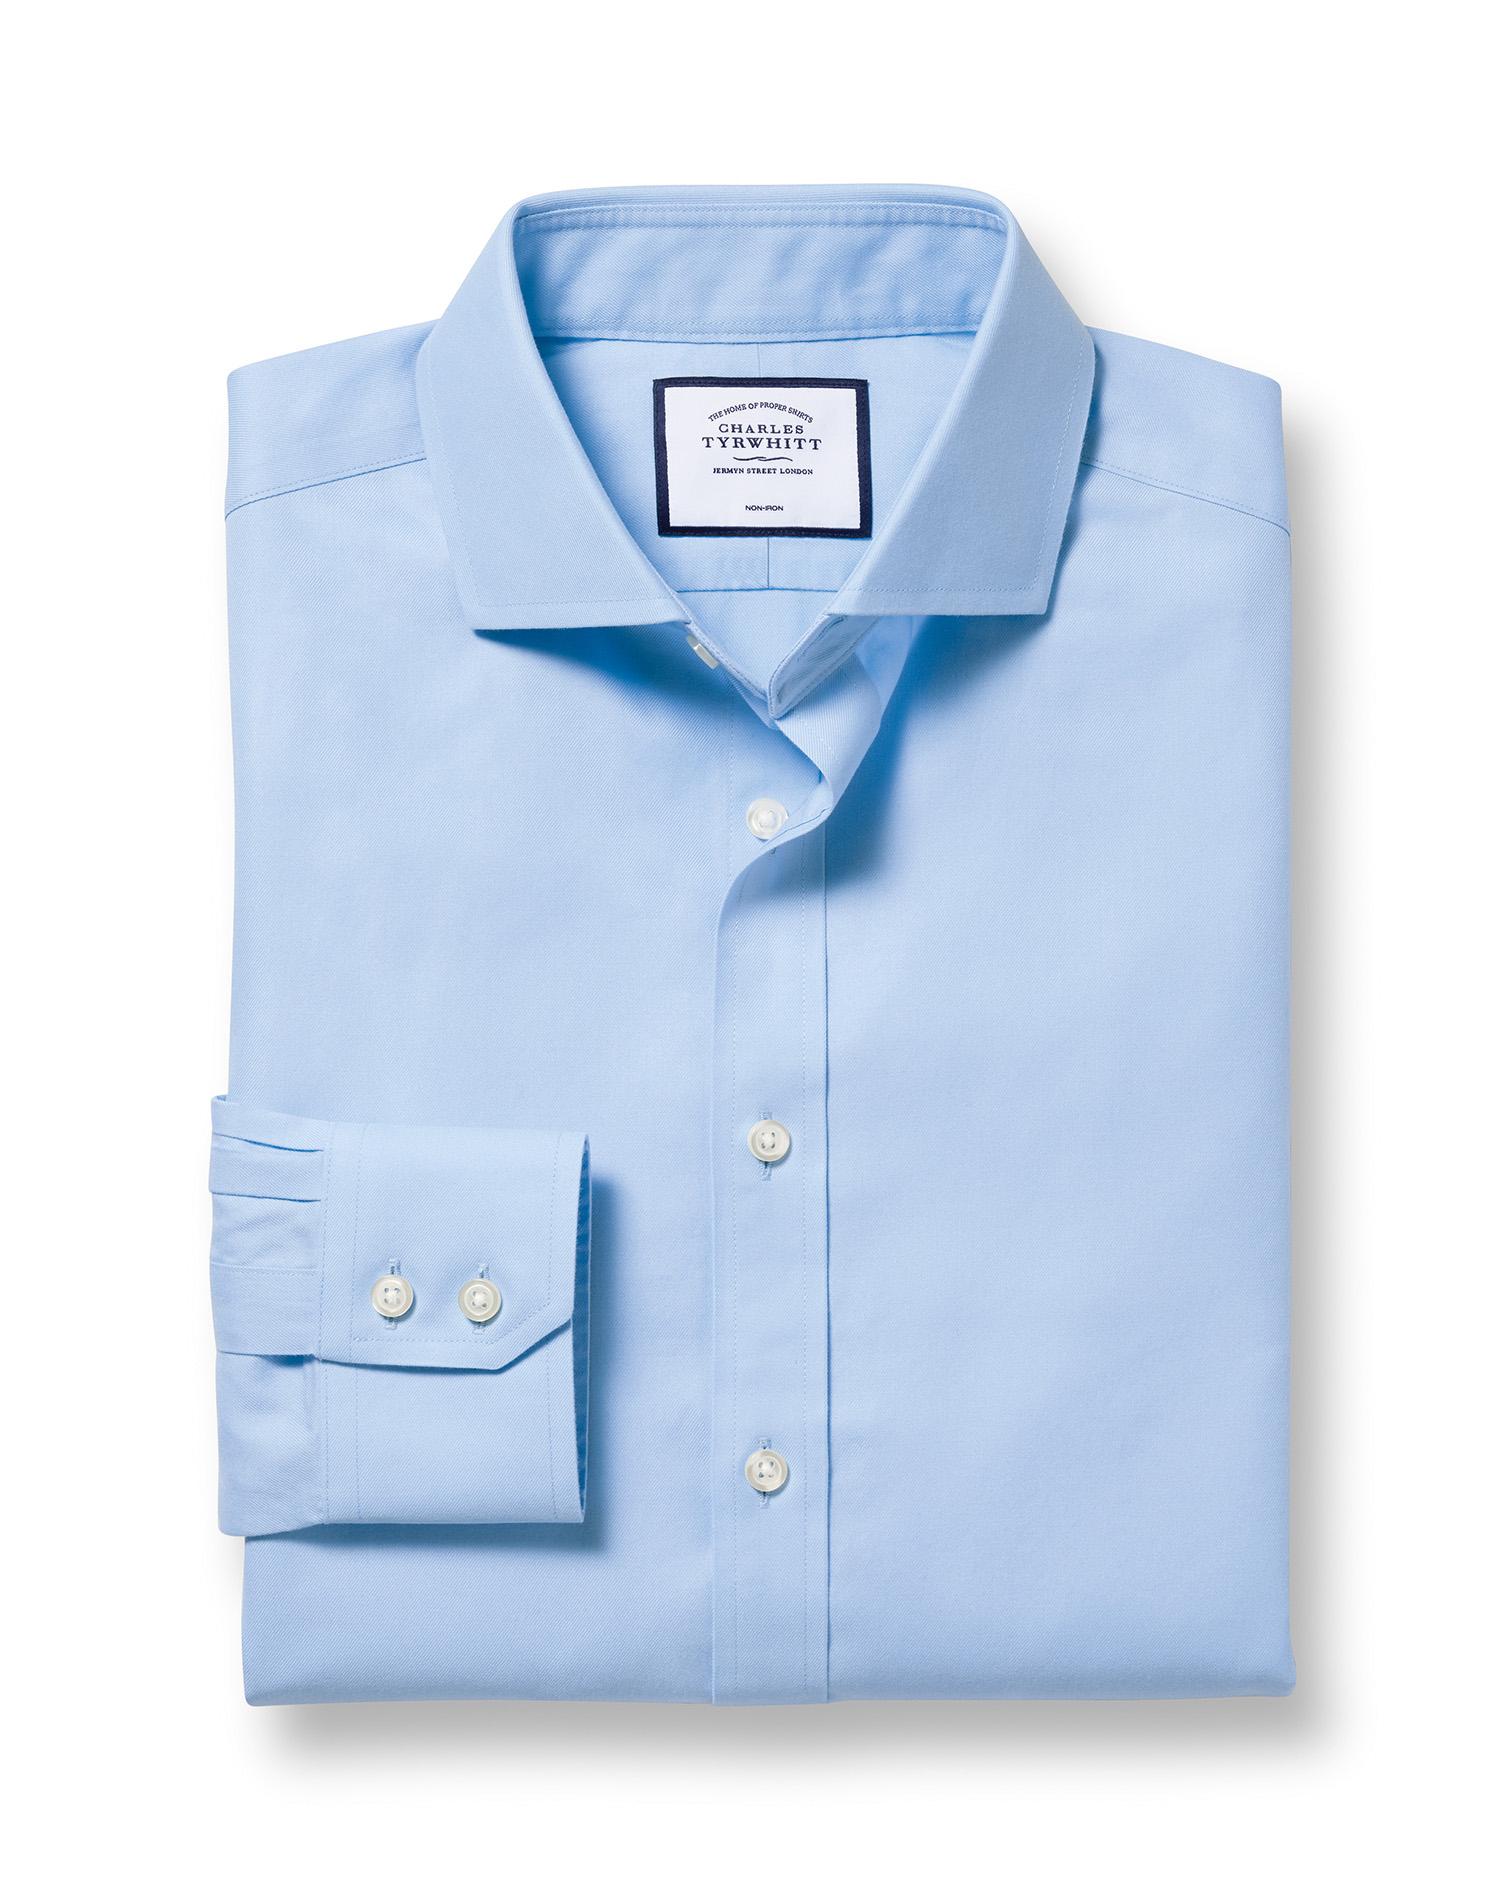 Slim Fit Sky Blue Non-Iron Twill Cutaway Collar Cotton Formal Shirt Single Cuff Size 14.5/33 by Char